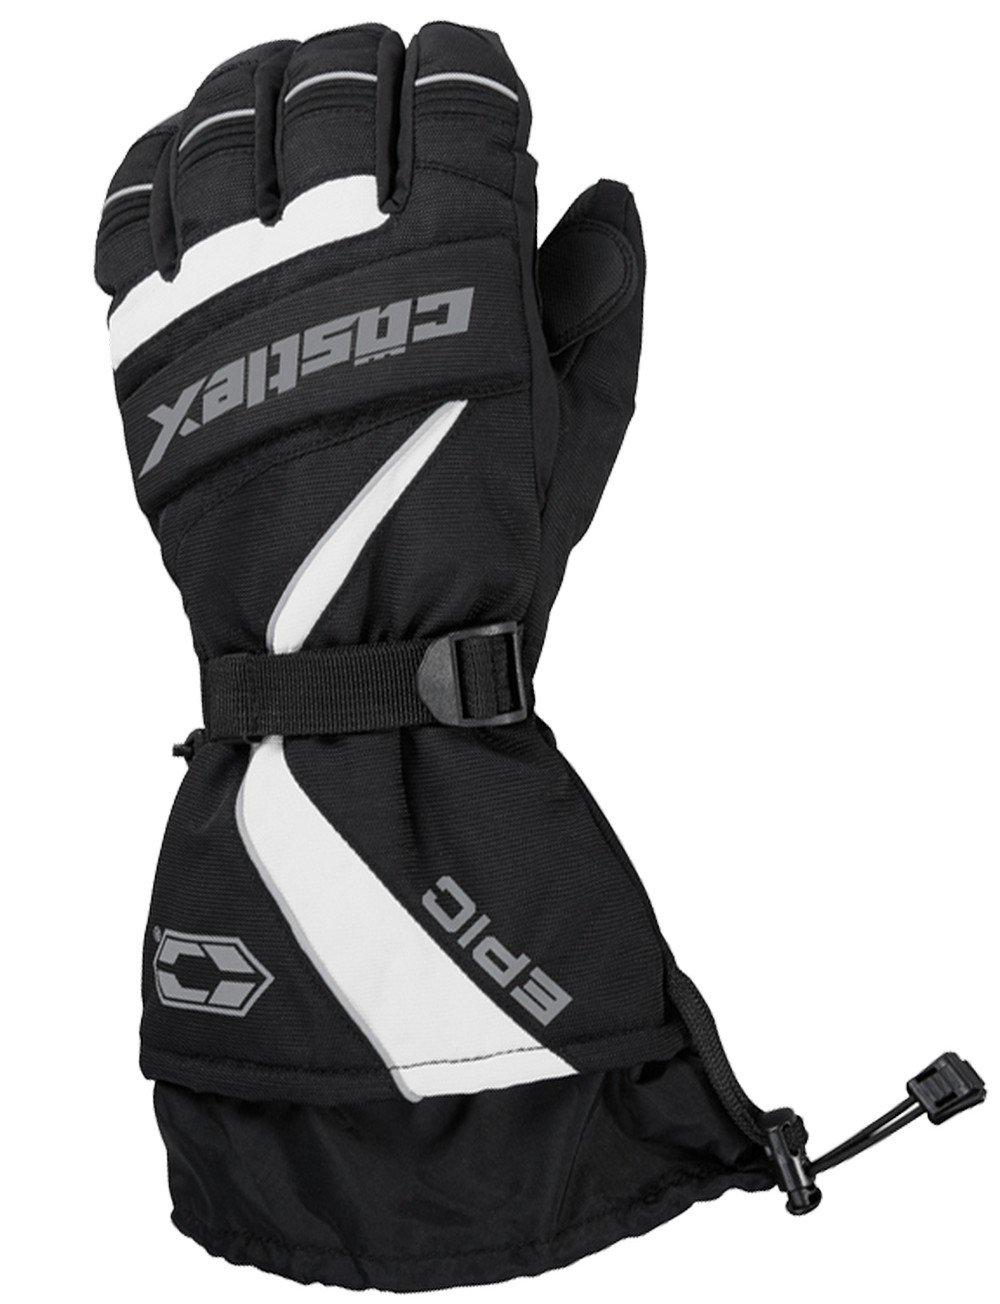 Castle X Epic-G1 Mens Snowmobile Gloves - White - XLG